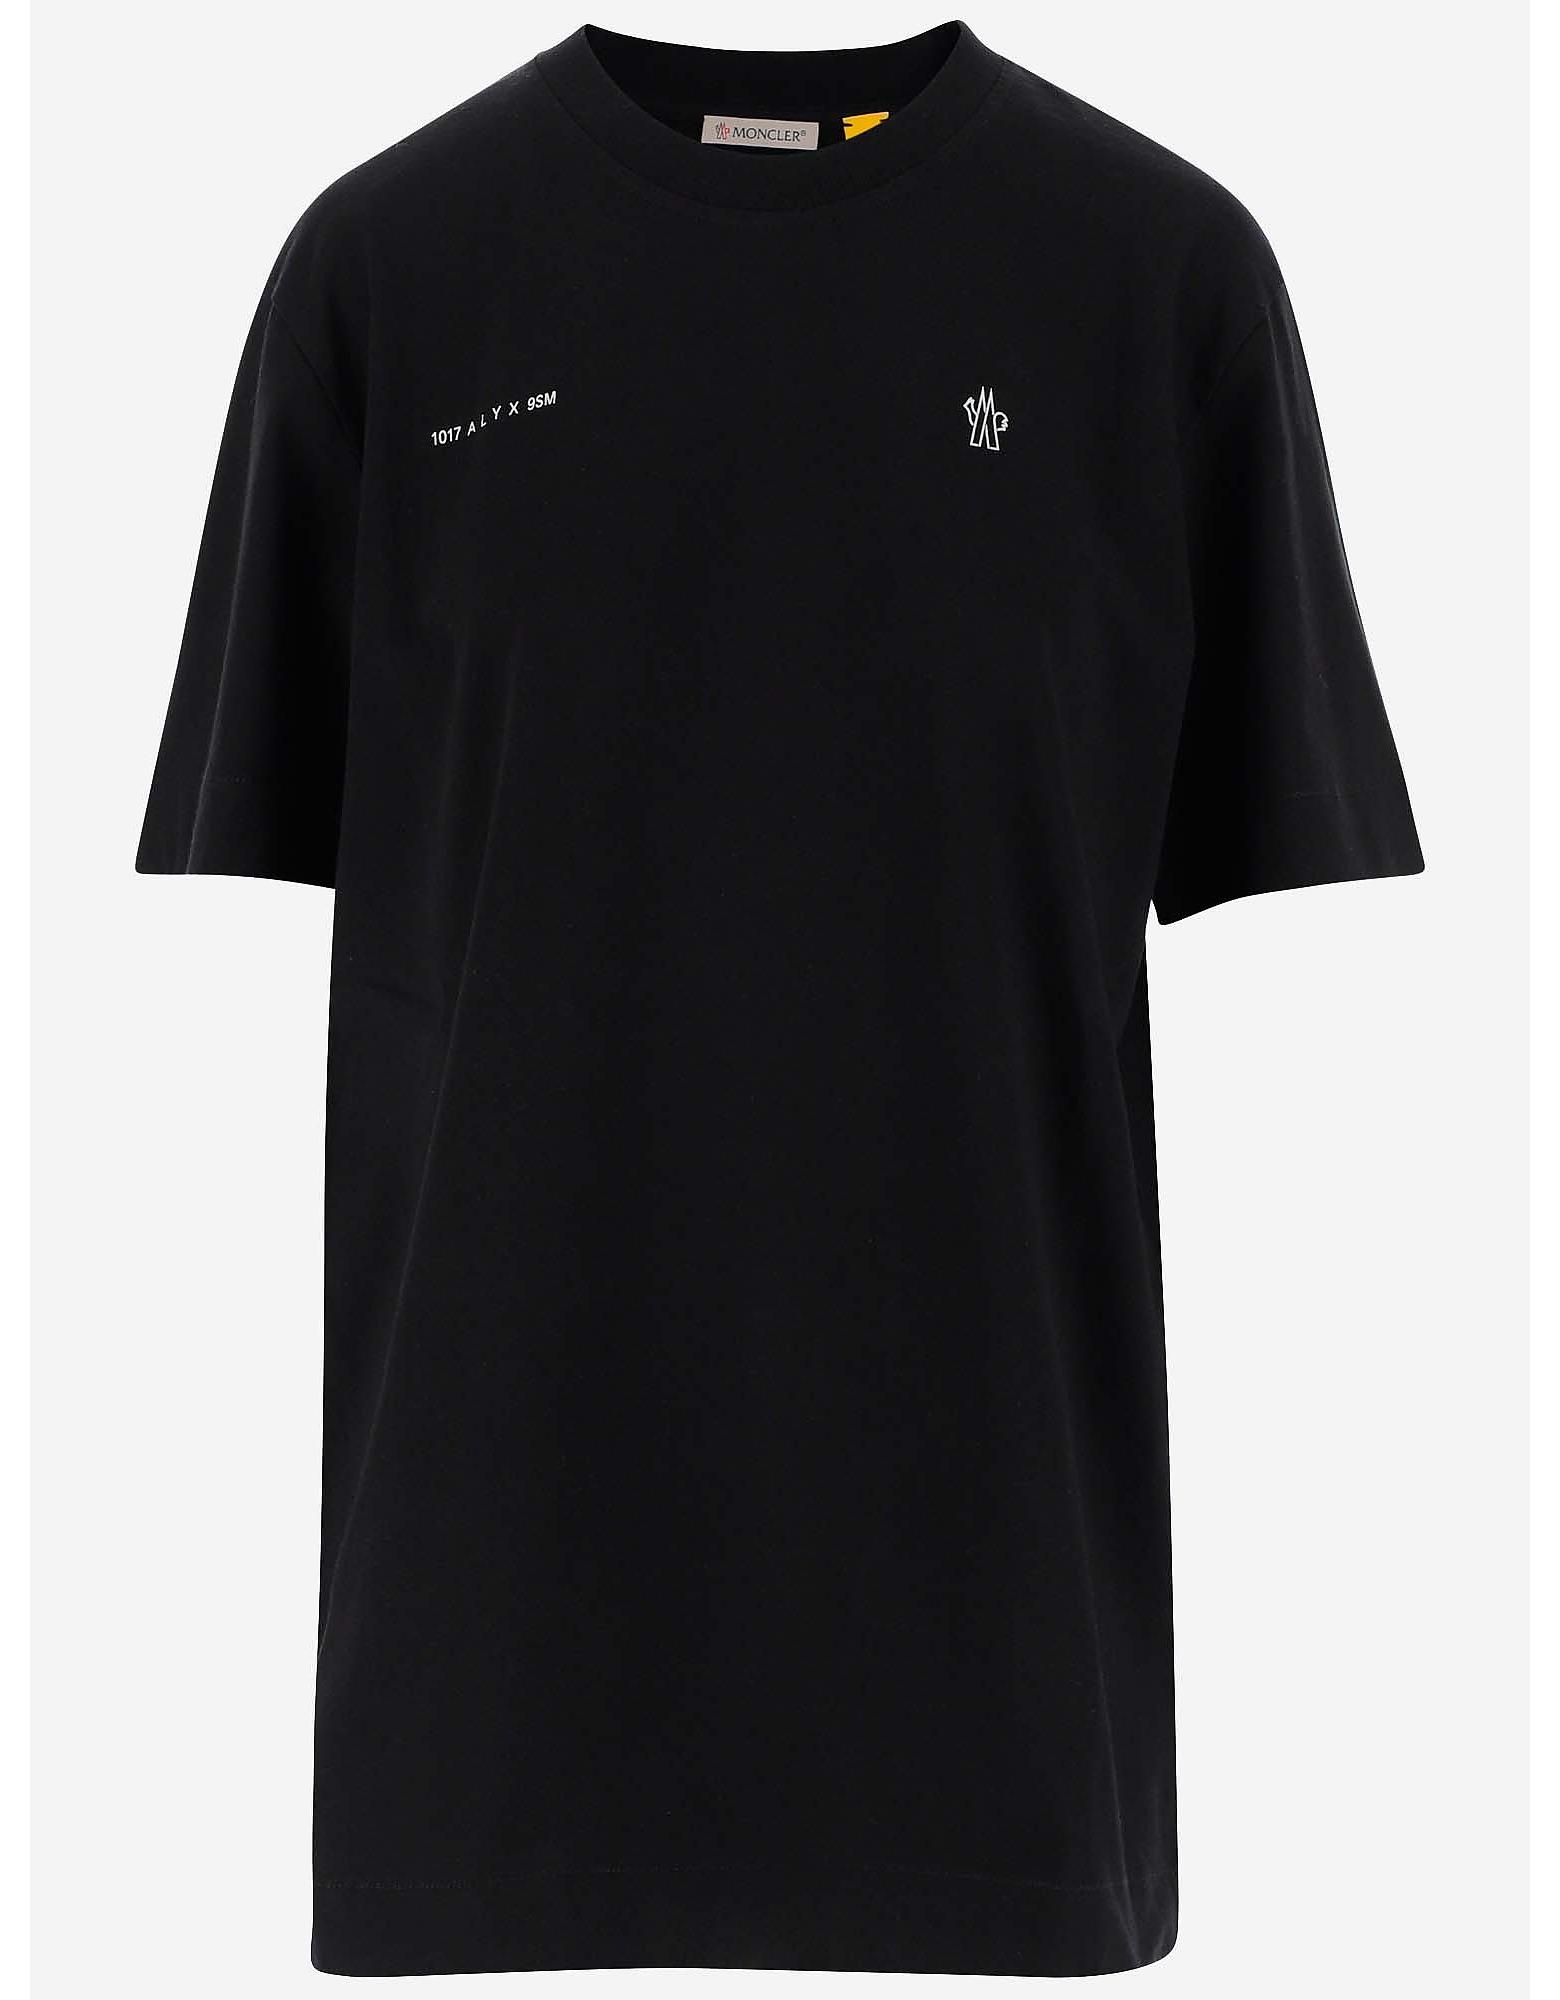 Moncler Designer T-Shirts & Tops, Women's Polo Shirt W/Short Sleeve